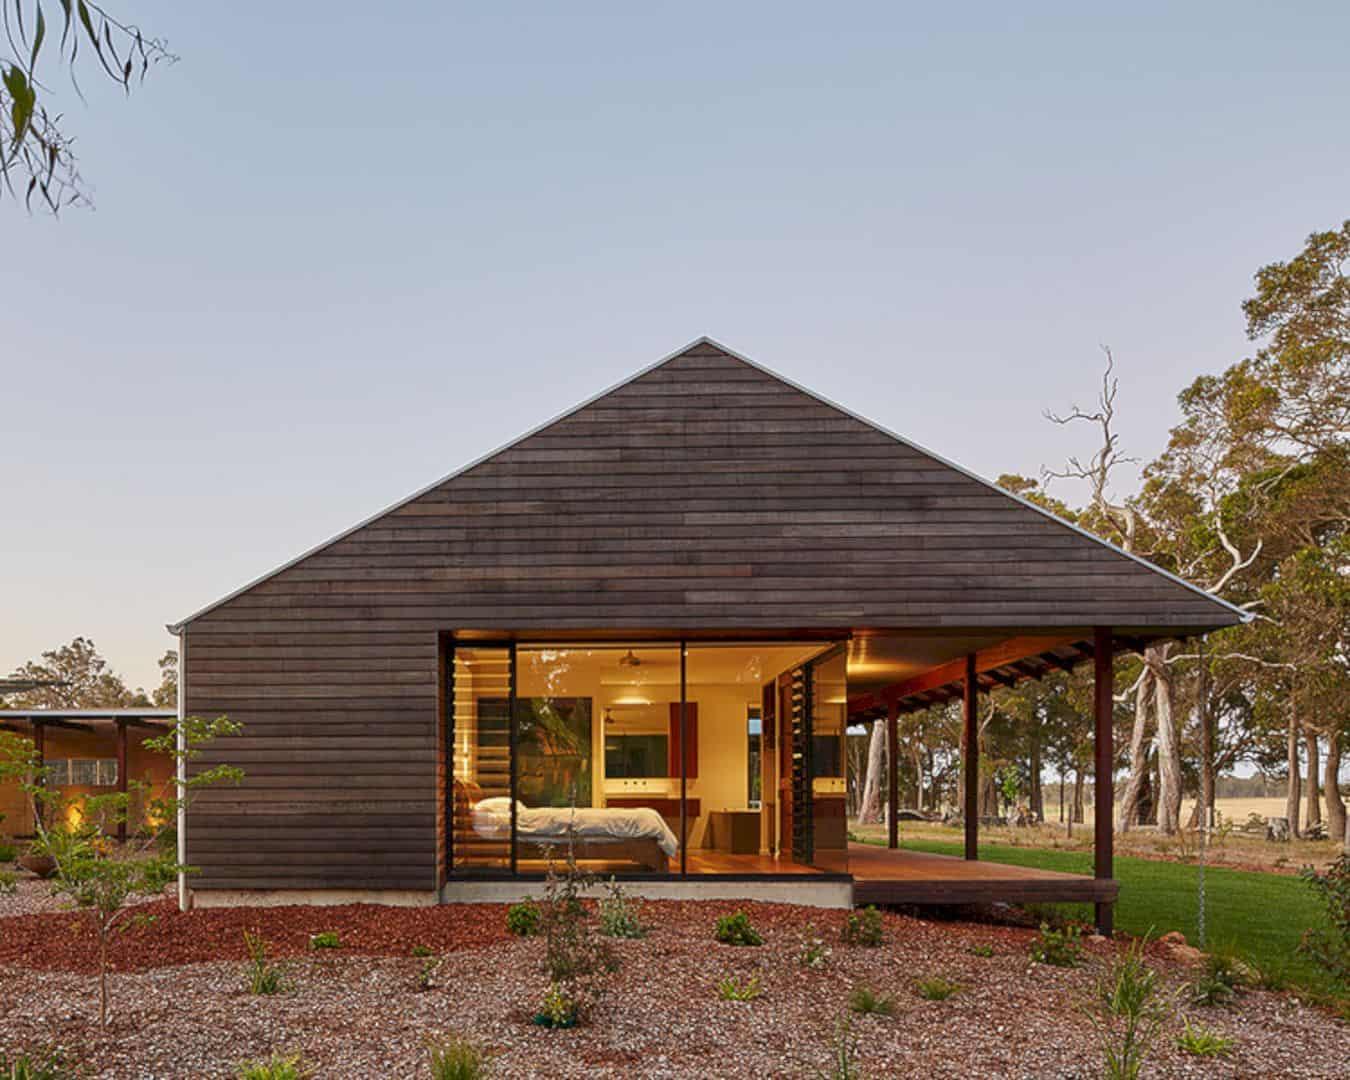 Farm House: A Modern Australian Farmhouse with Climate and Features Technologies